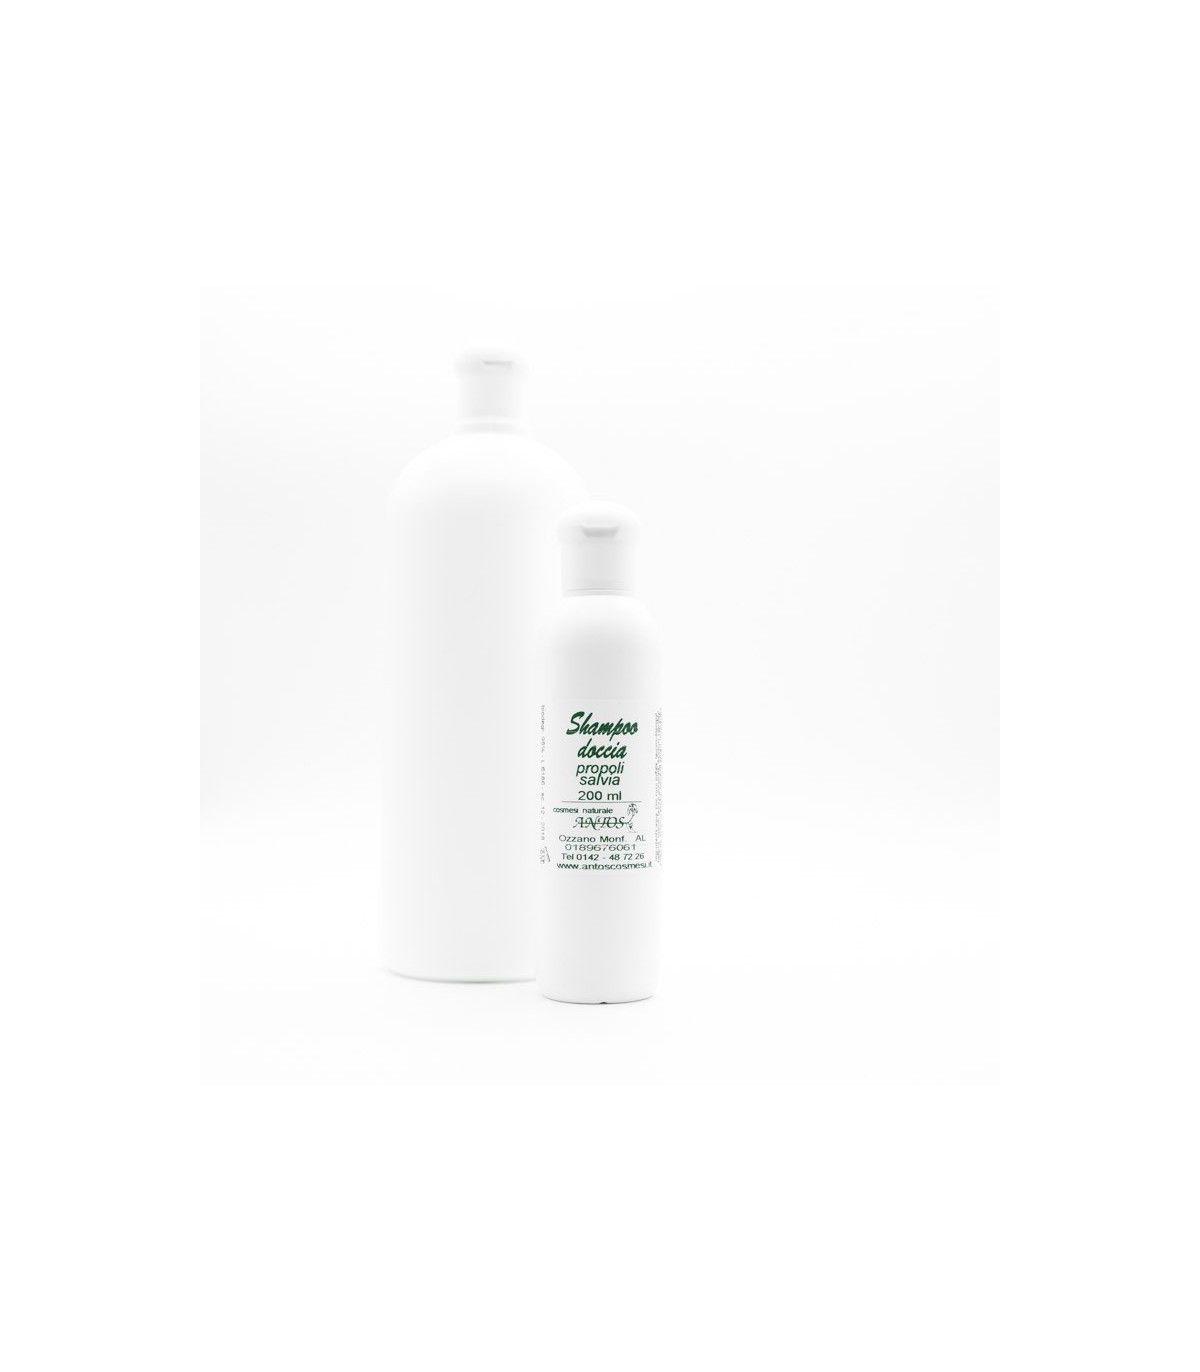 Shampoo doccia - litro